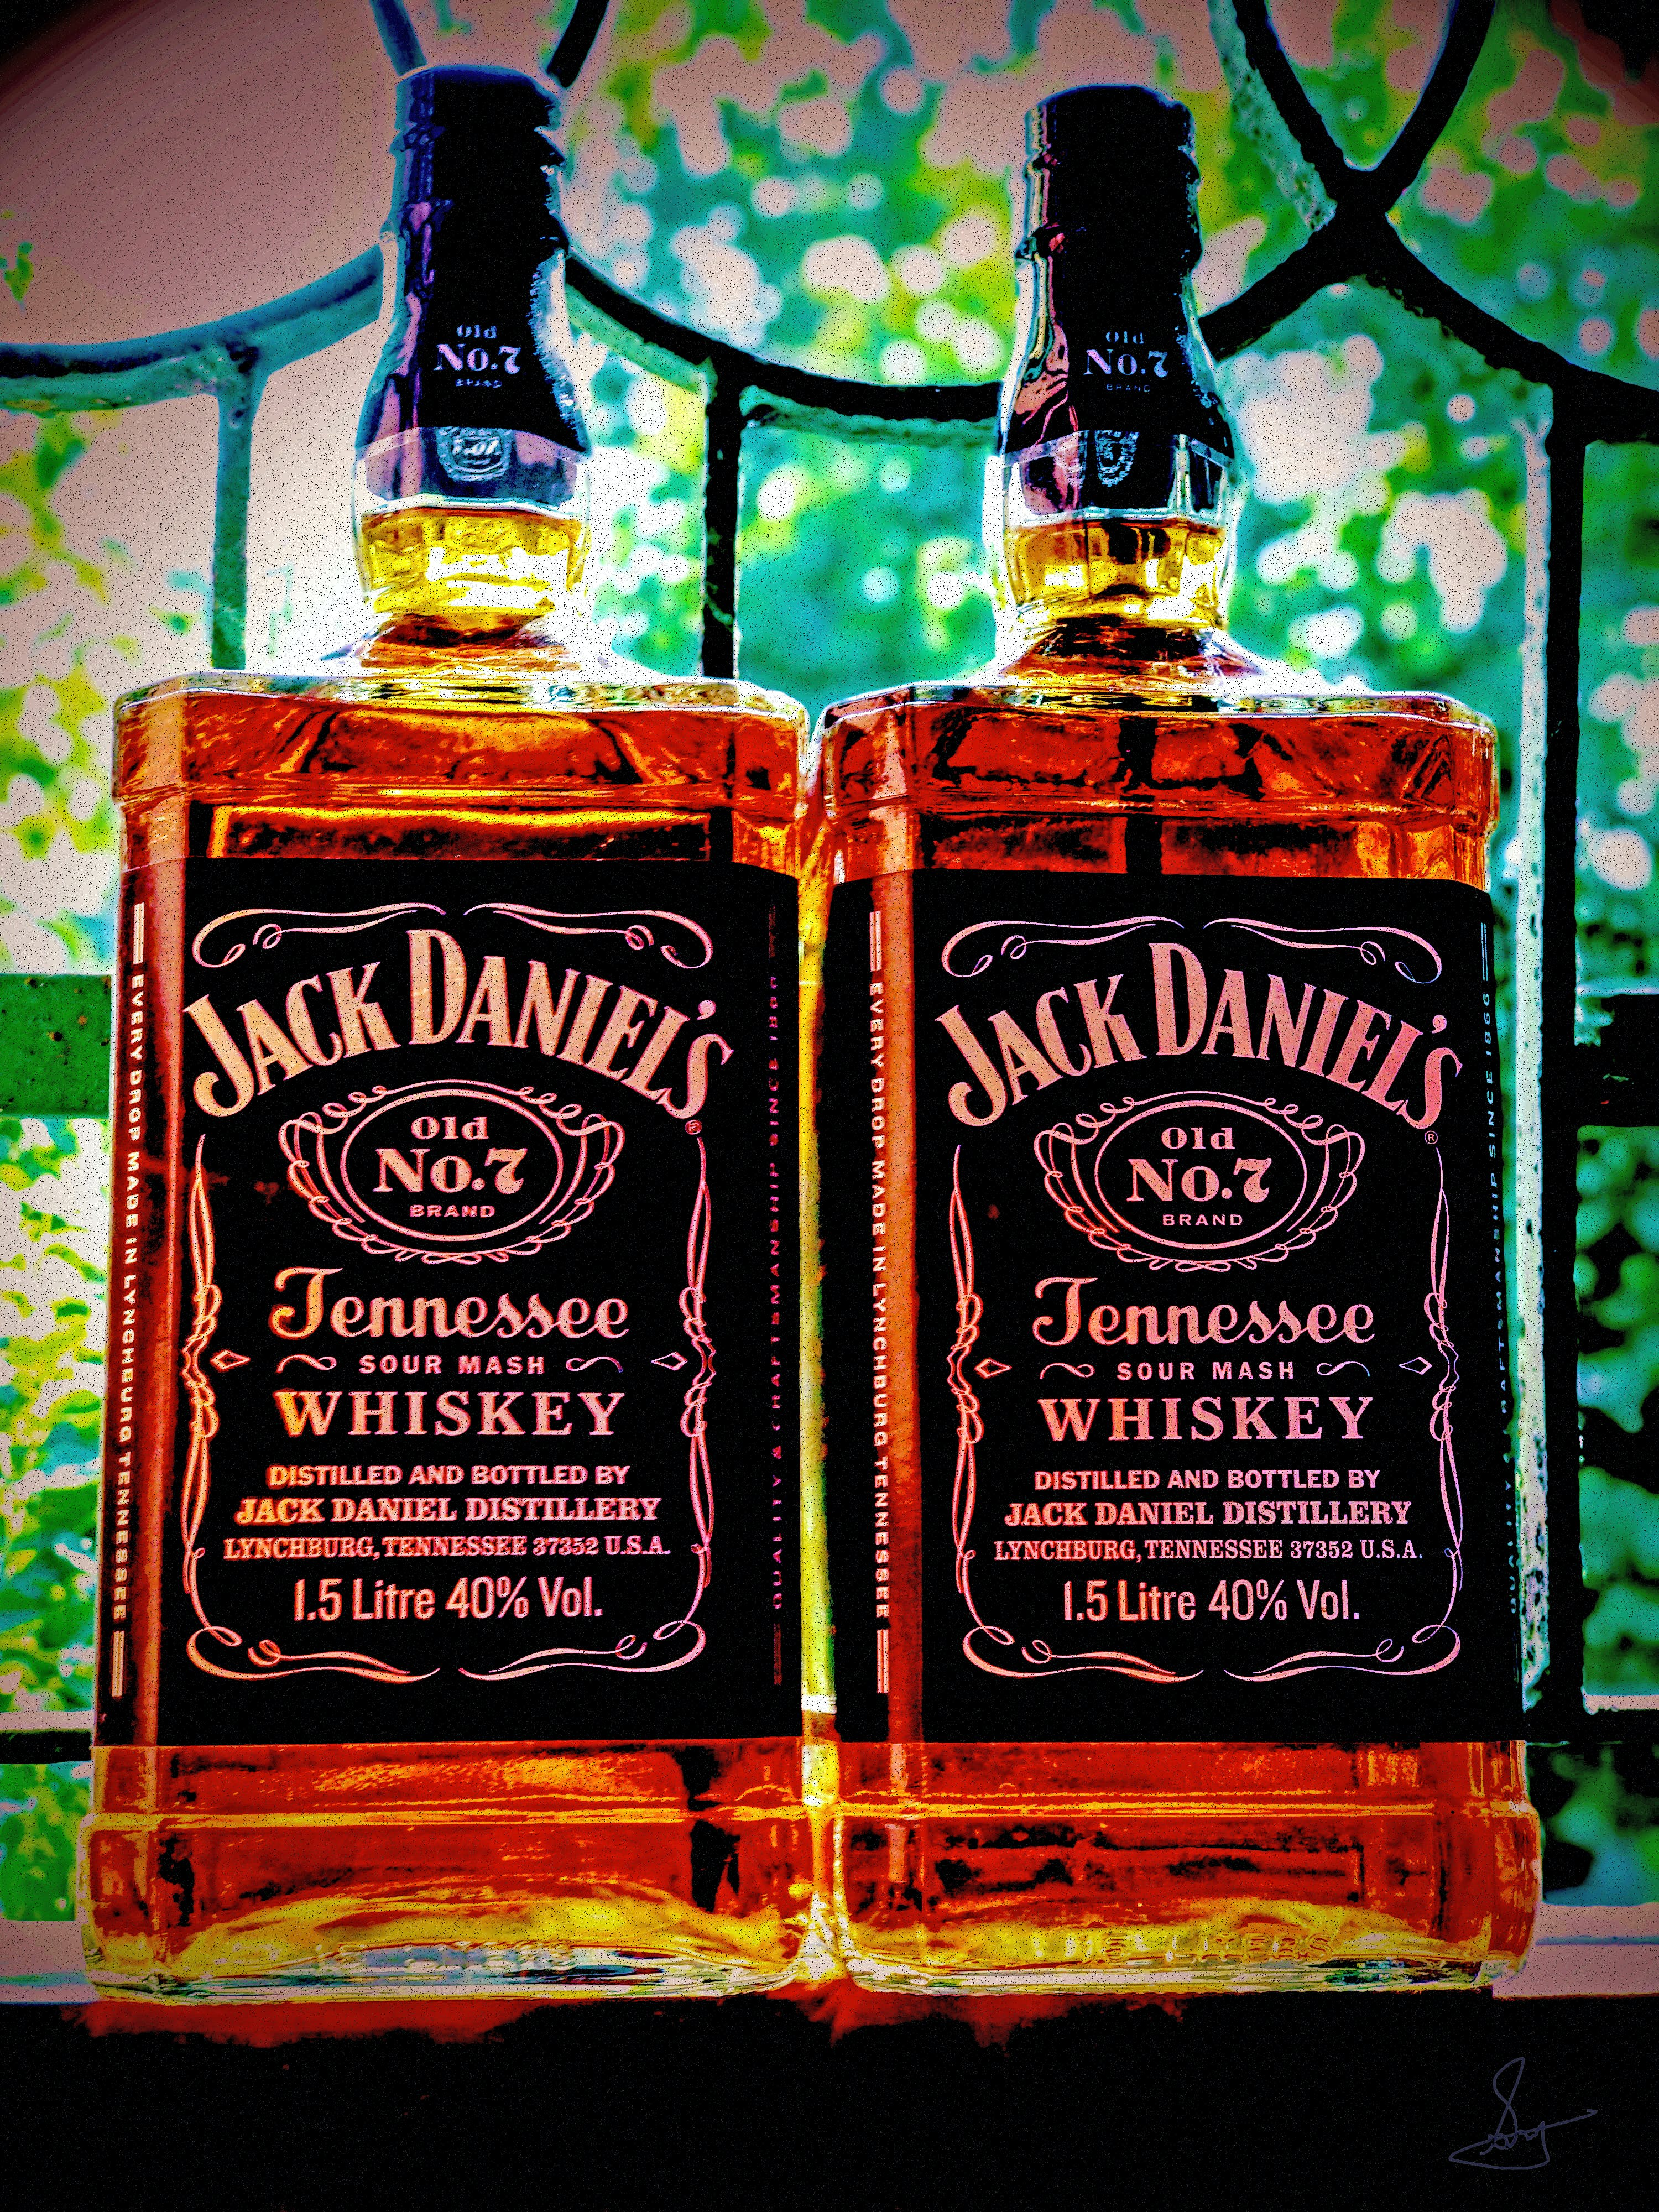 Free stock photo of Jack Daniels, product, whiskey